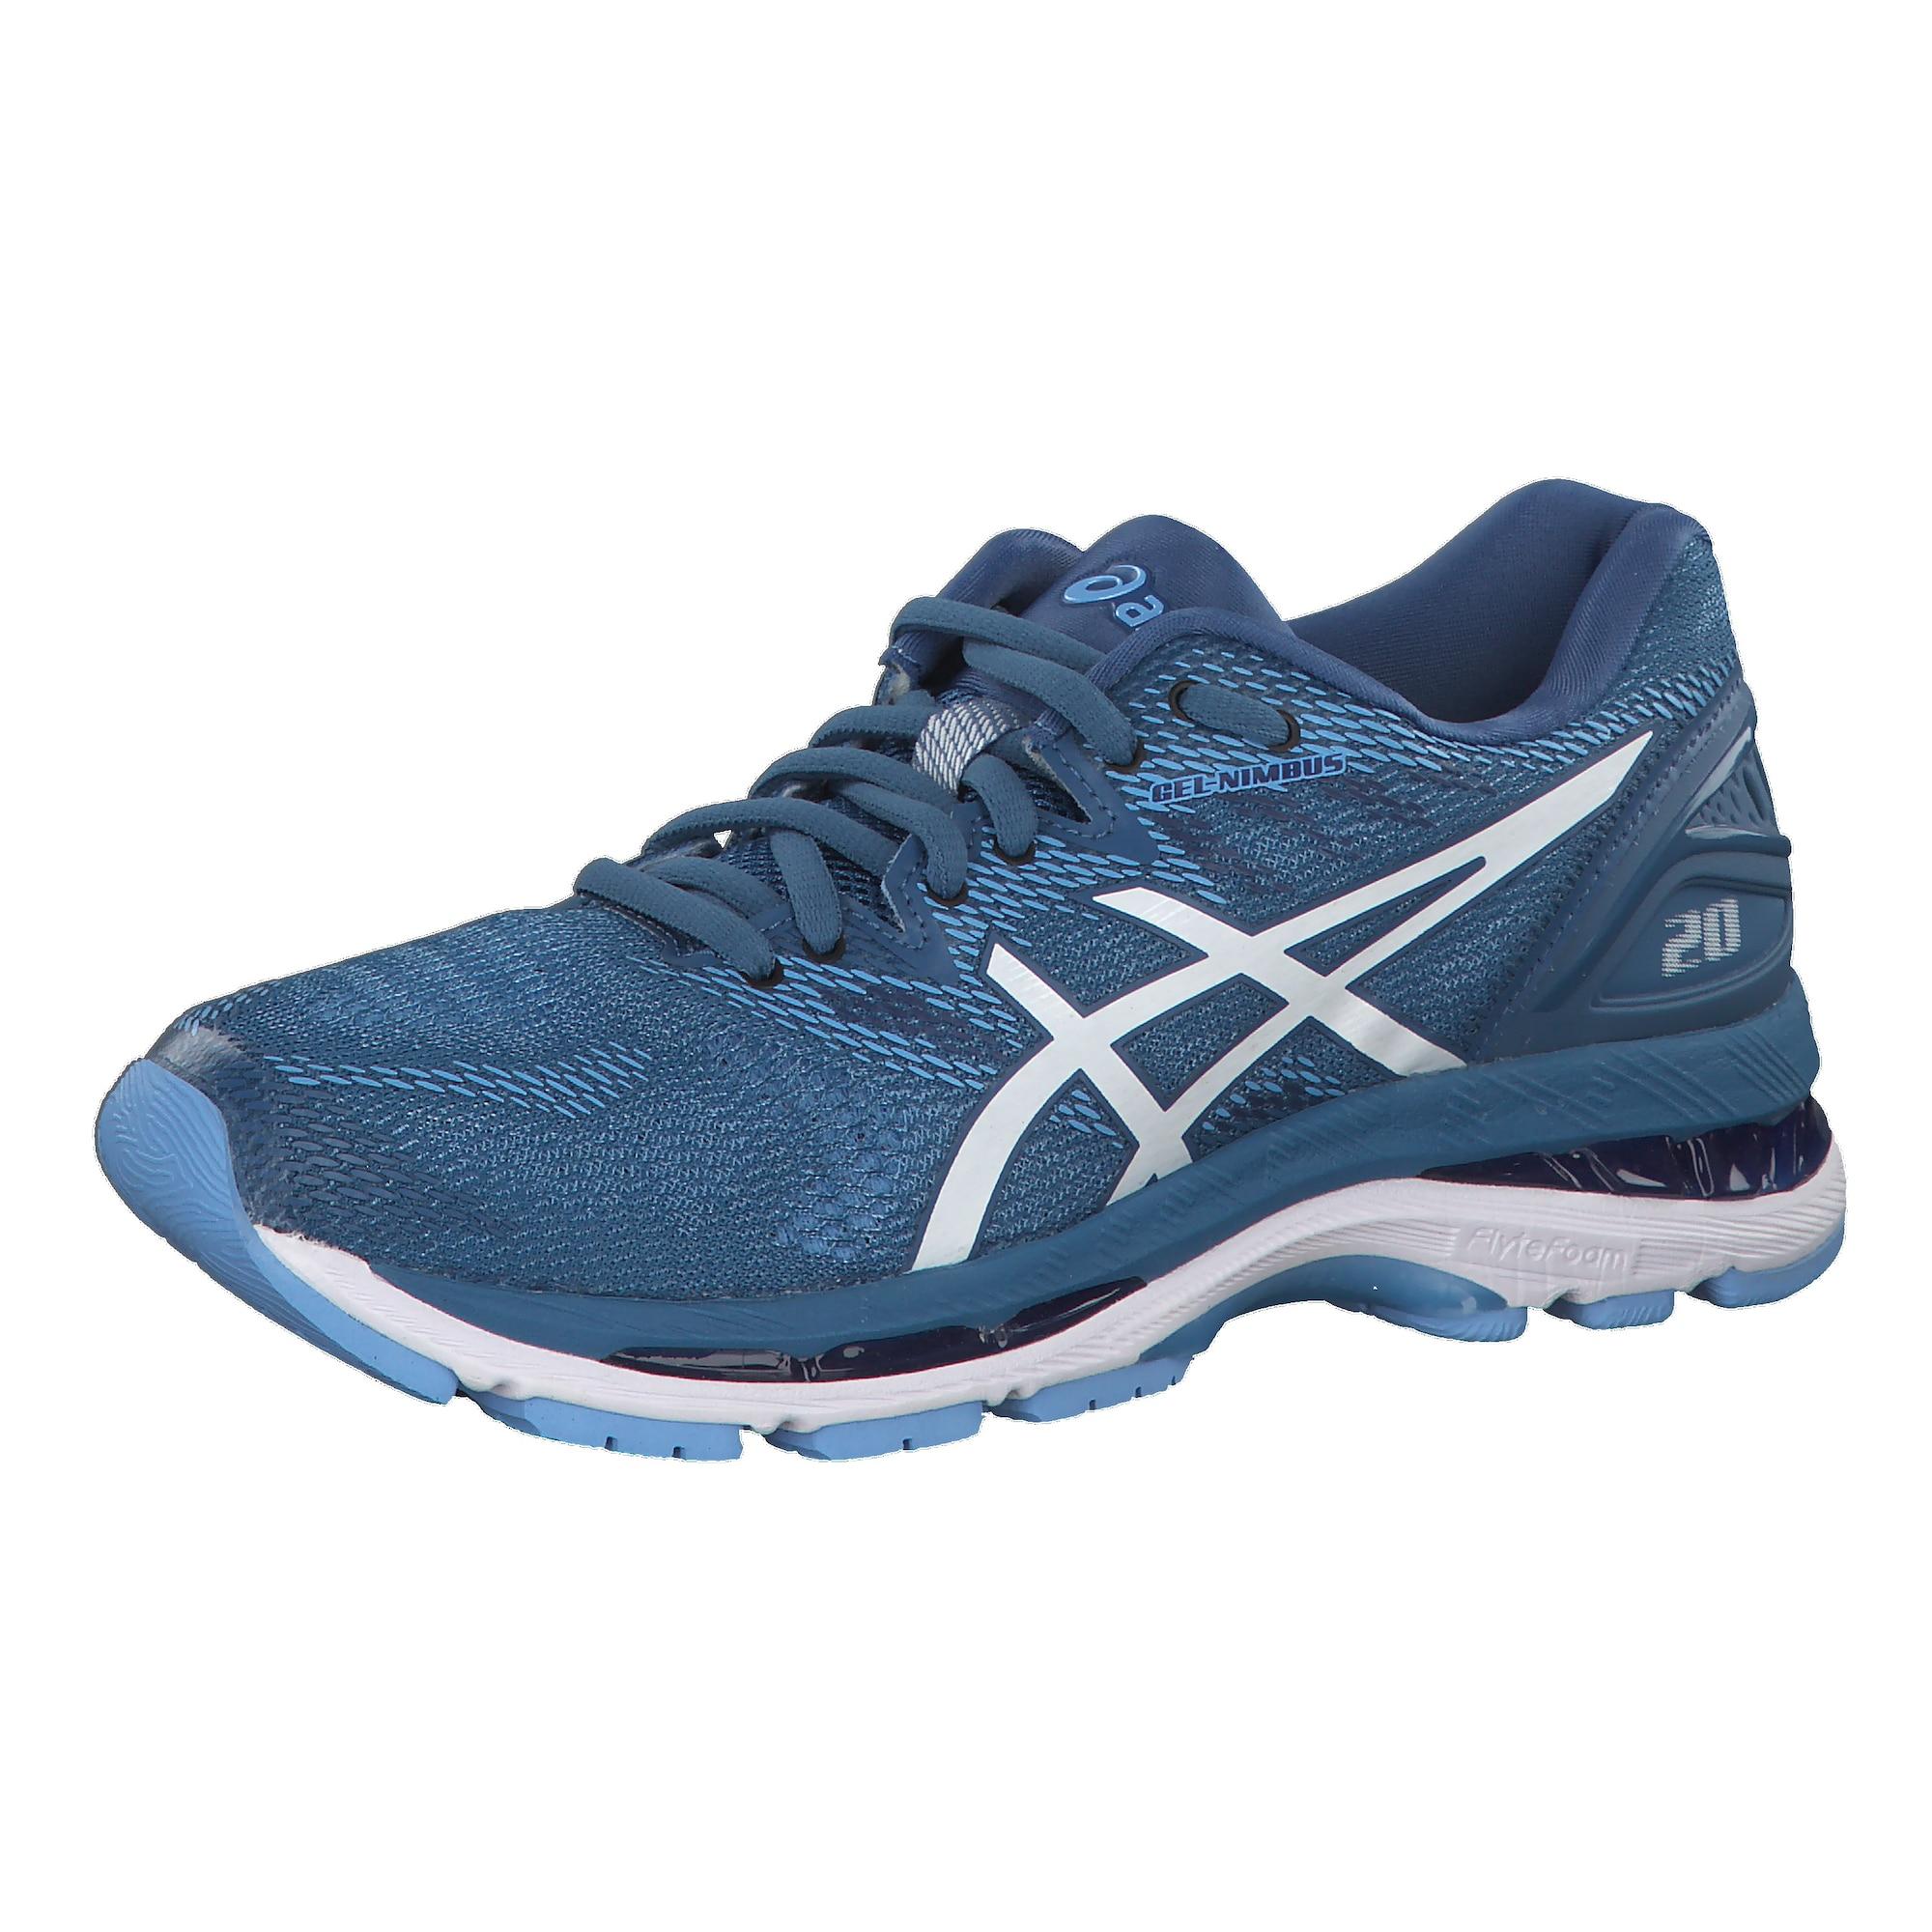 Laufschuhe 'Gel-Nimbus 20' | Schuhe > Sportschuhe > Laufschuhe | ASICS